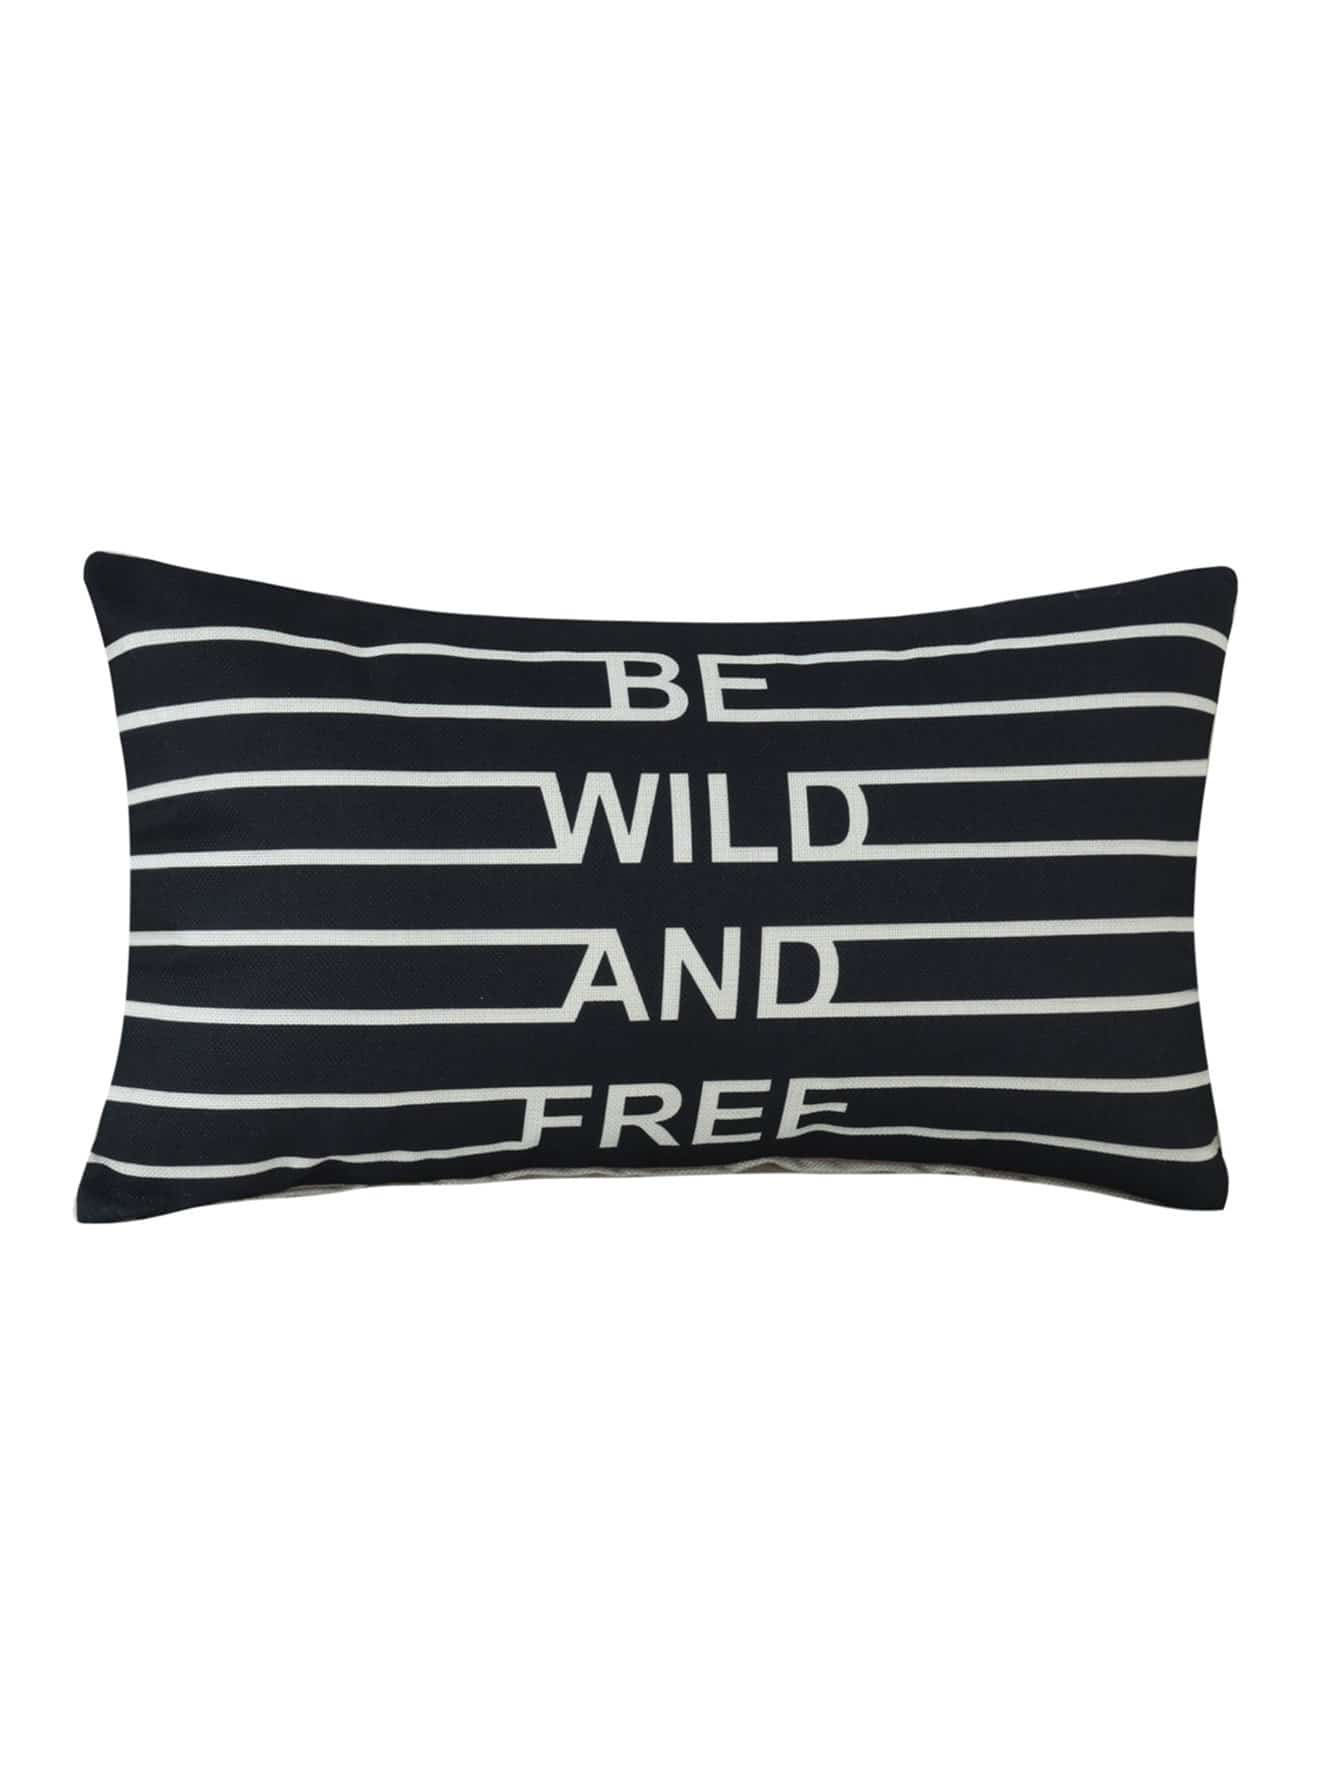 Letter & Striped Print Pillowcase Cover 1PC